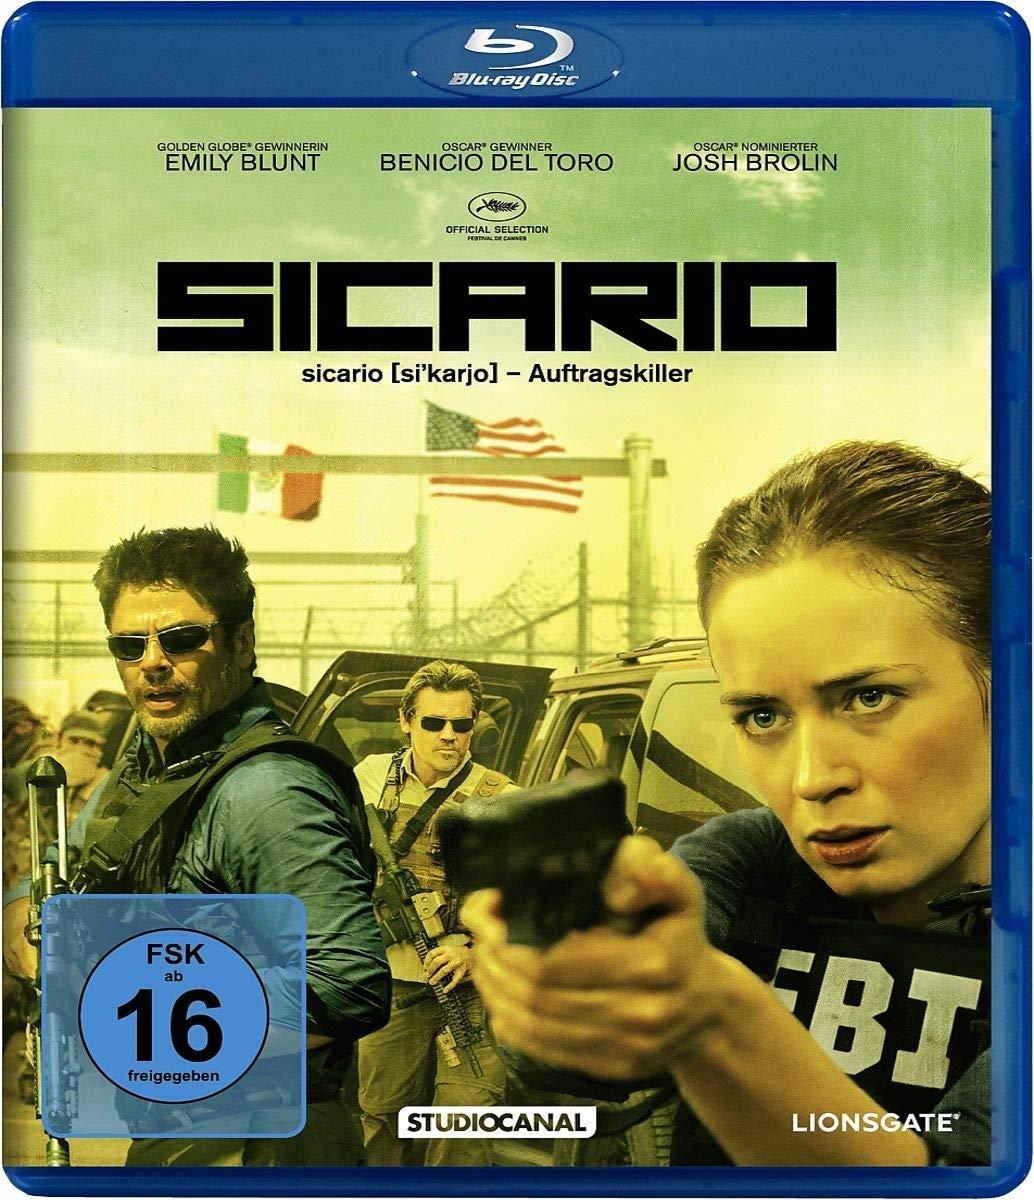 DVD Blu-ray amazon